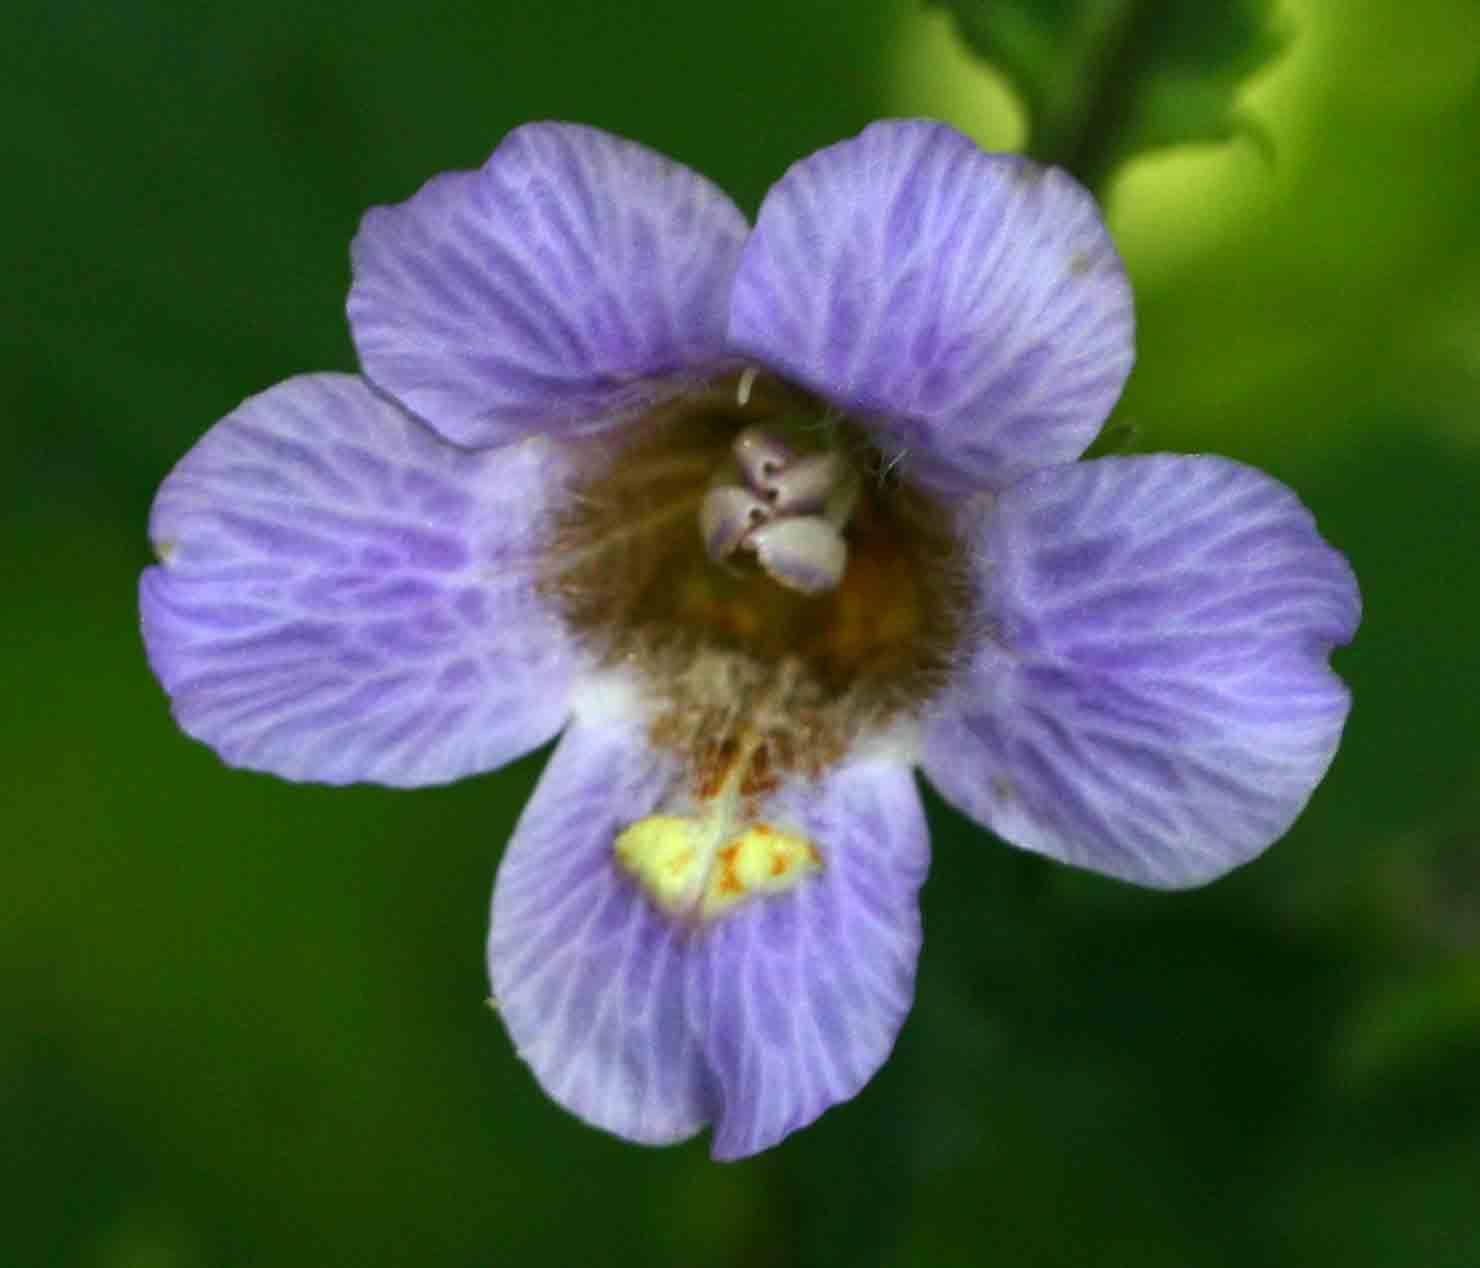 Mimulopsis solmsii